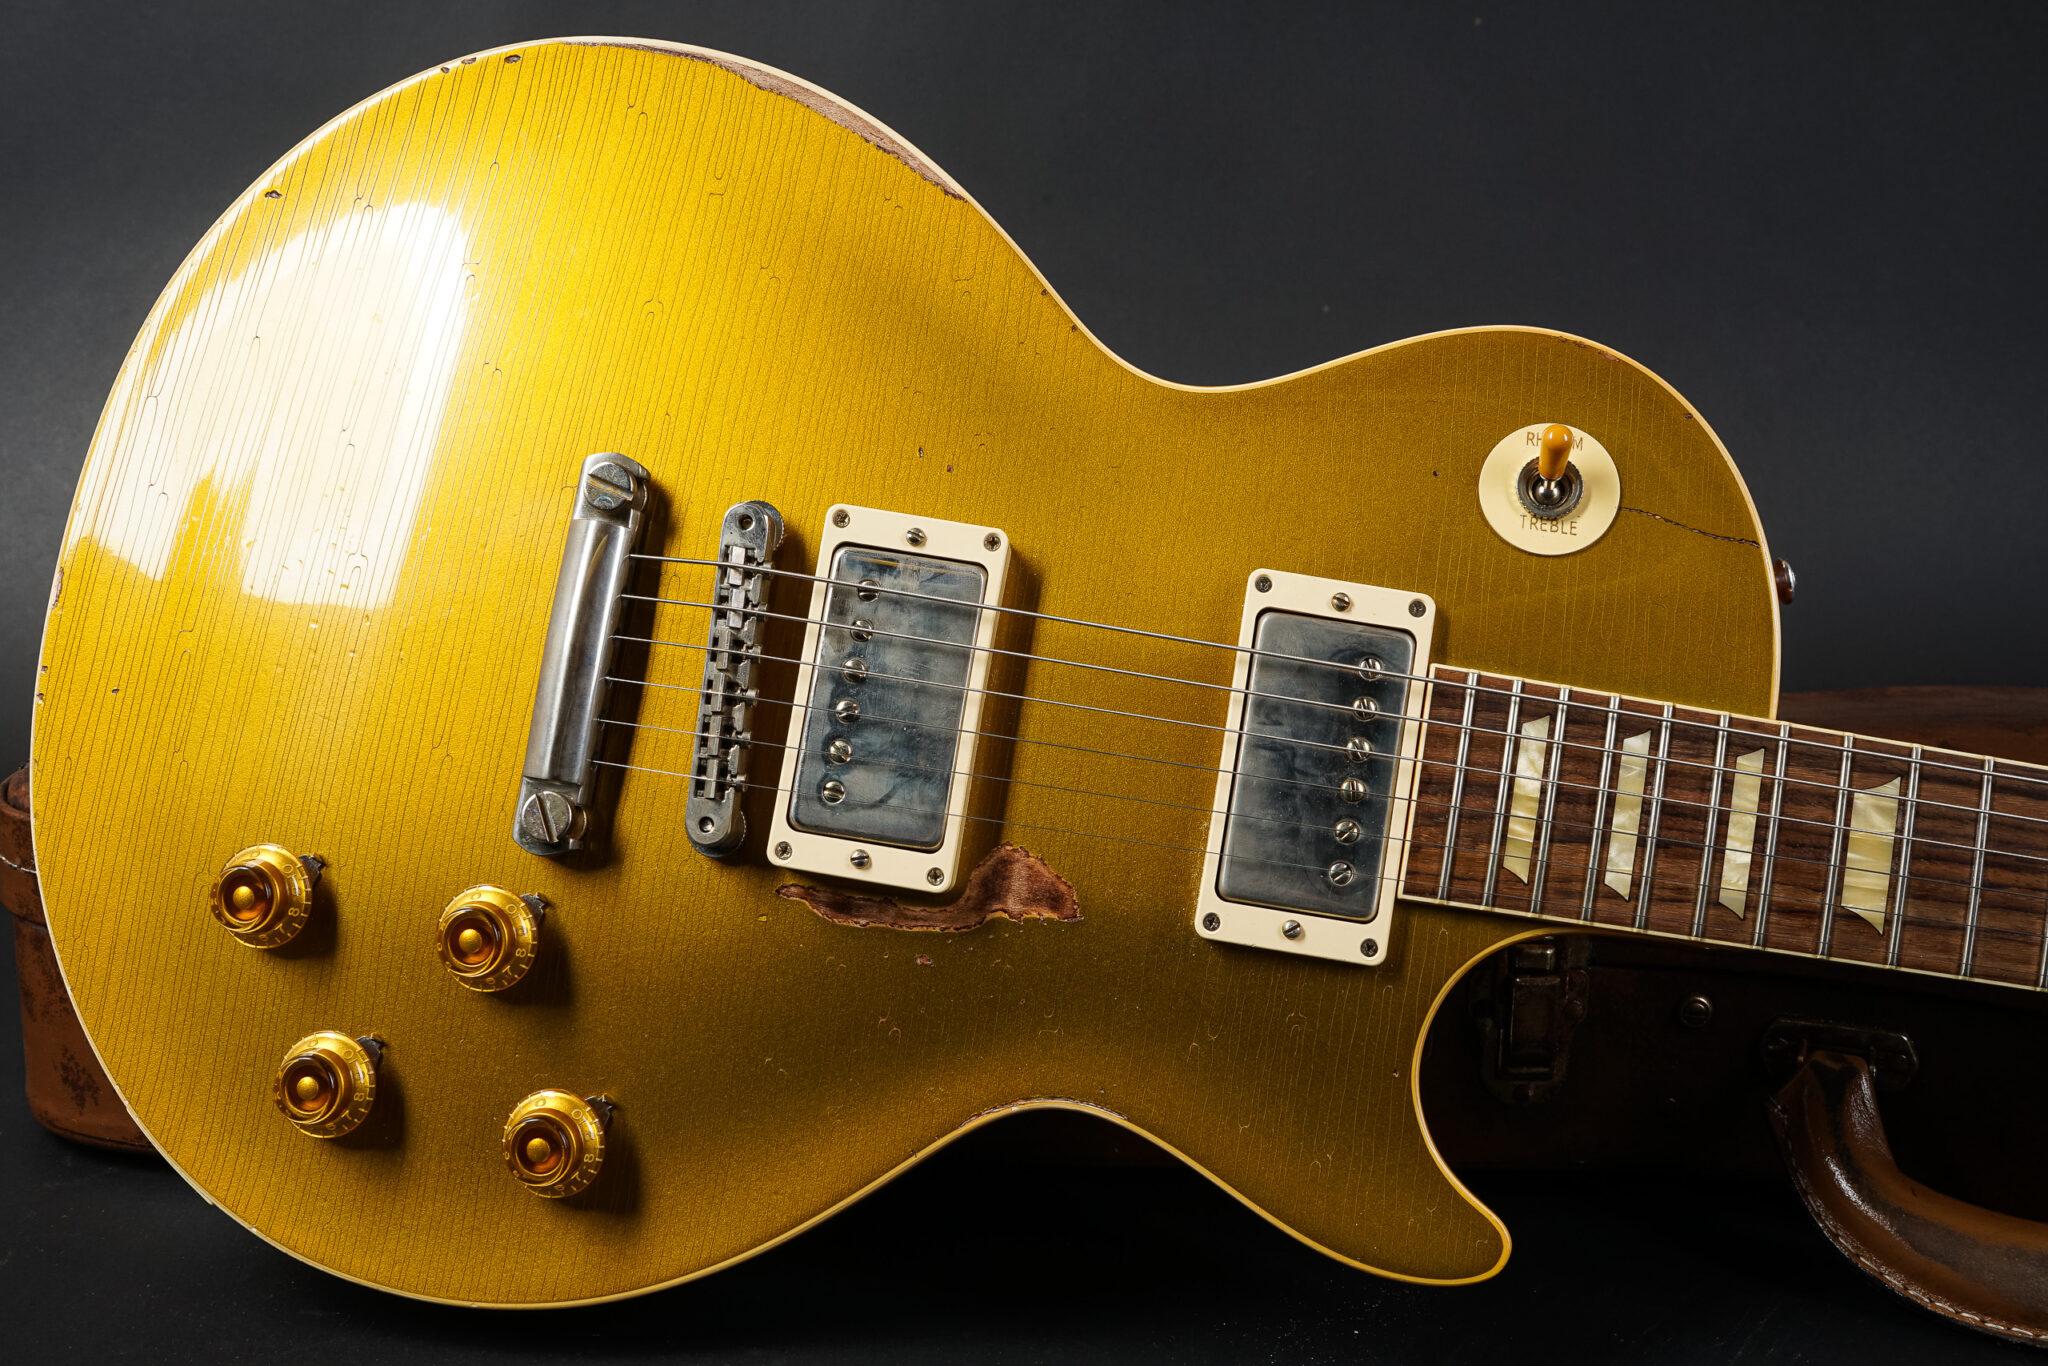 https://guitarpoint.de/app/uploads/products/2019-gibson-les-paul-1957-goldtop-reissue-one-off-79810-367kg/2019-Gibson-Les-Paul-1957-Reissue-Aged-79810-7-2048x1366.jpg